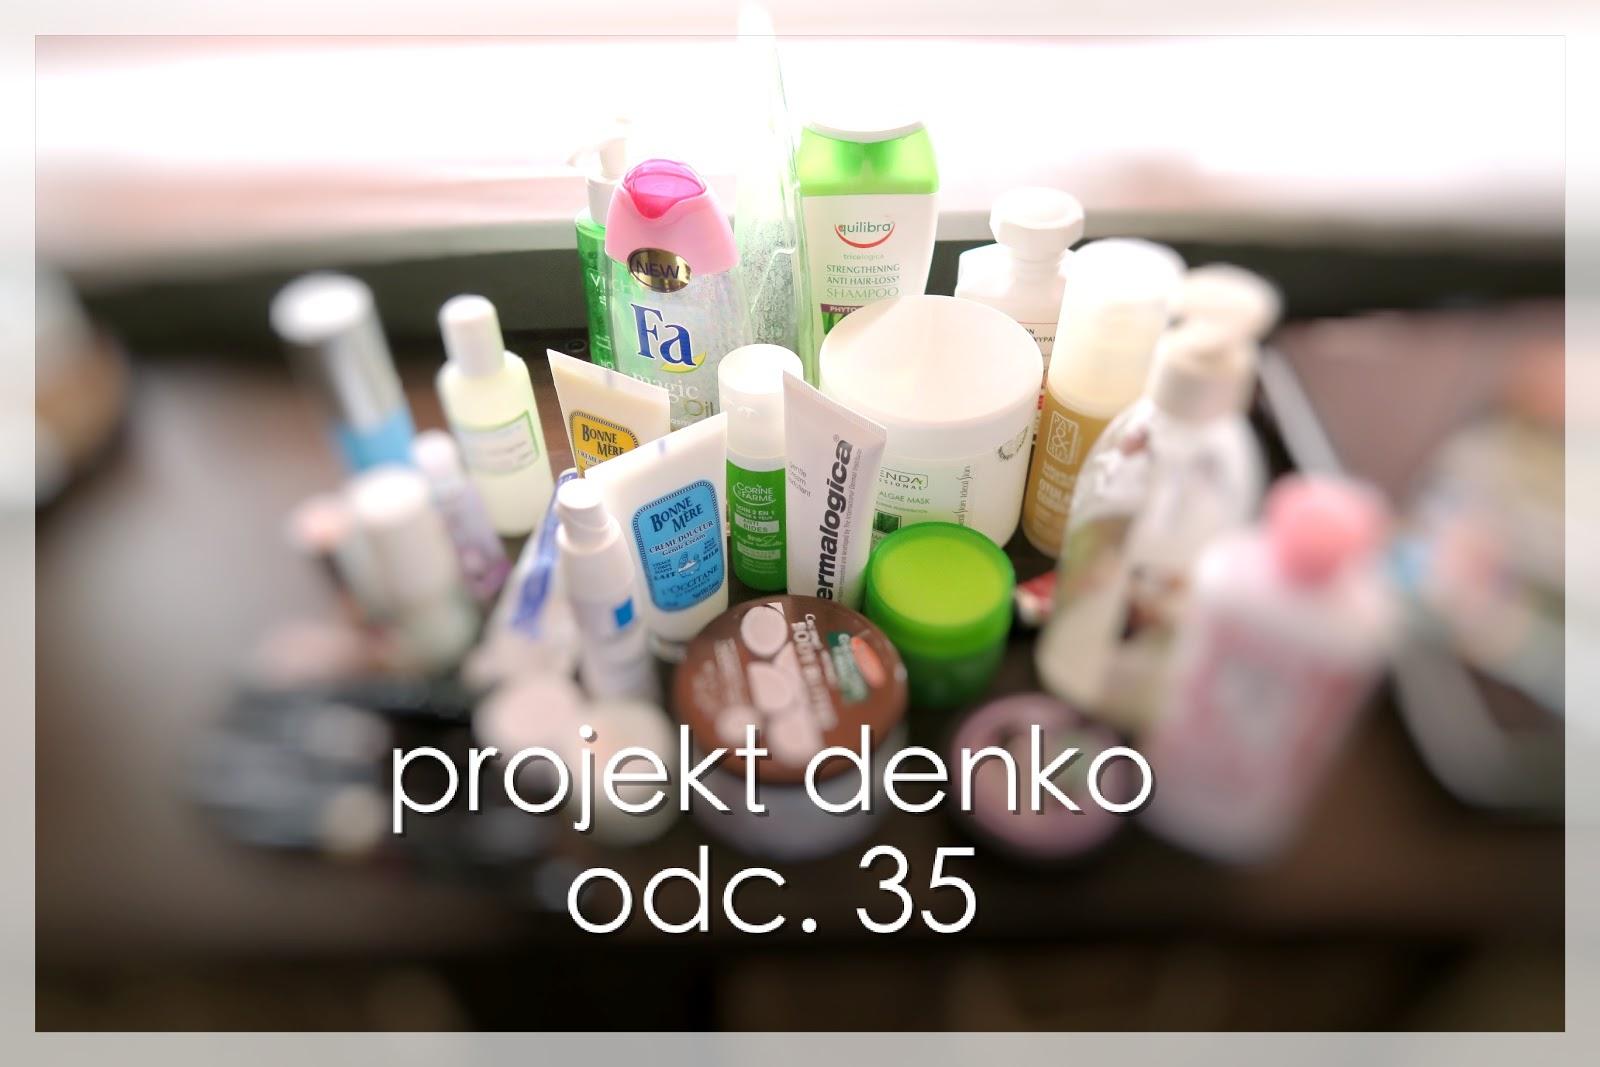 Projekt denko, odc. 35